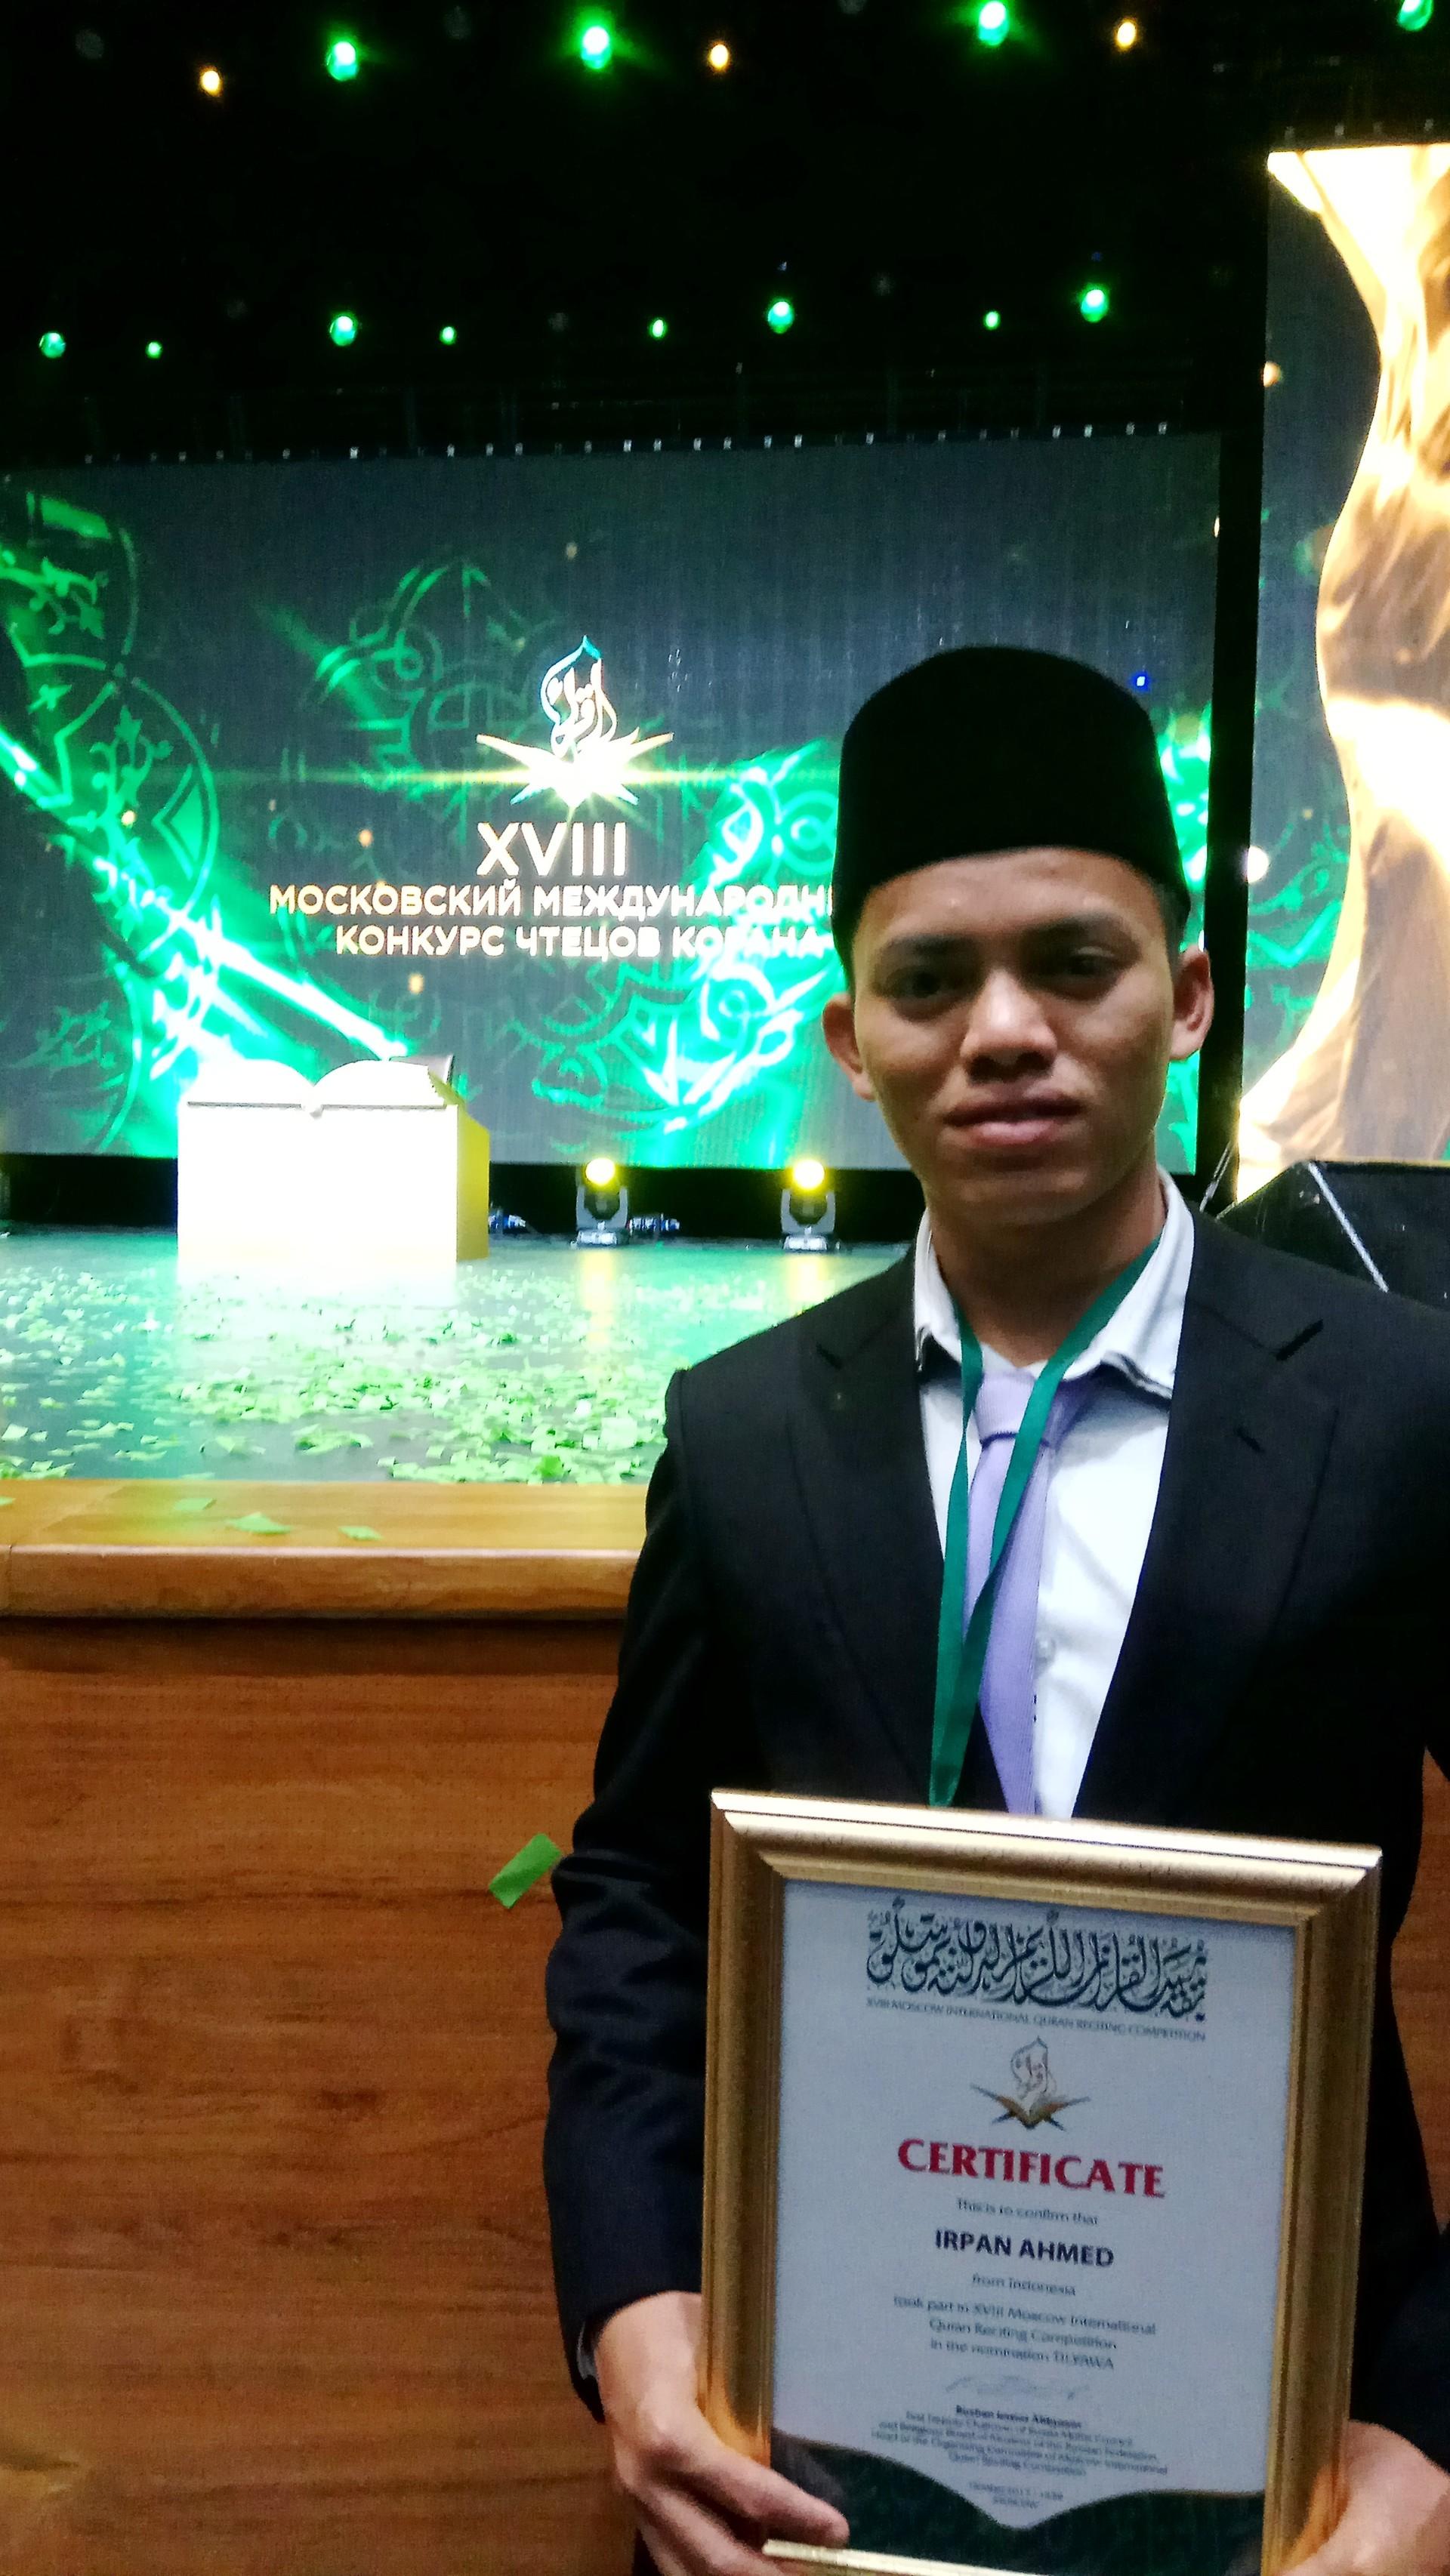 Tahun ini, Indonesia diwakili oleh Irfan bin Ahmad Timat, seorang pemuda asal Kepulauan Riau yang sebelumnya meraih juara II kategori tilawah tingkat remaja pada Musabaqah Tilawatil Quran (MTQ) Nasional ke-26 di Lombok tahun lalu.